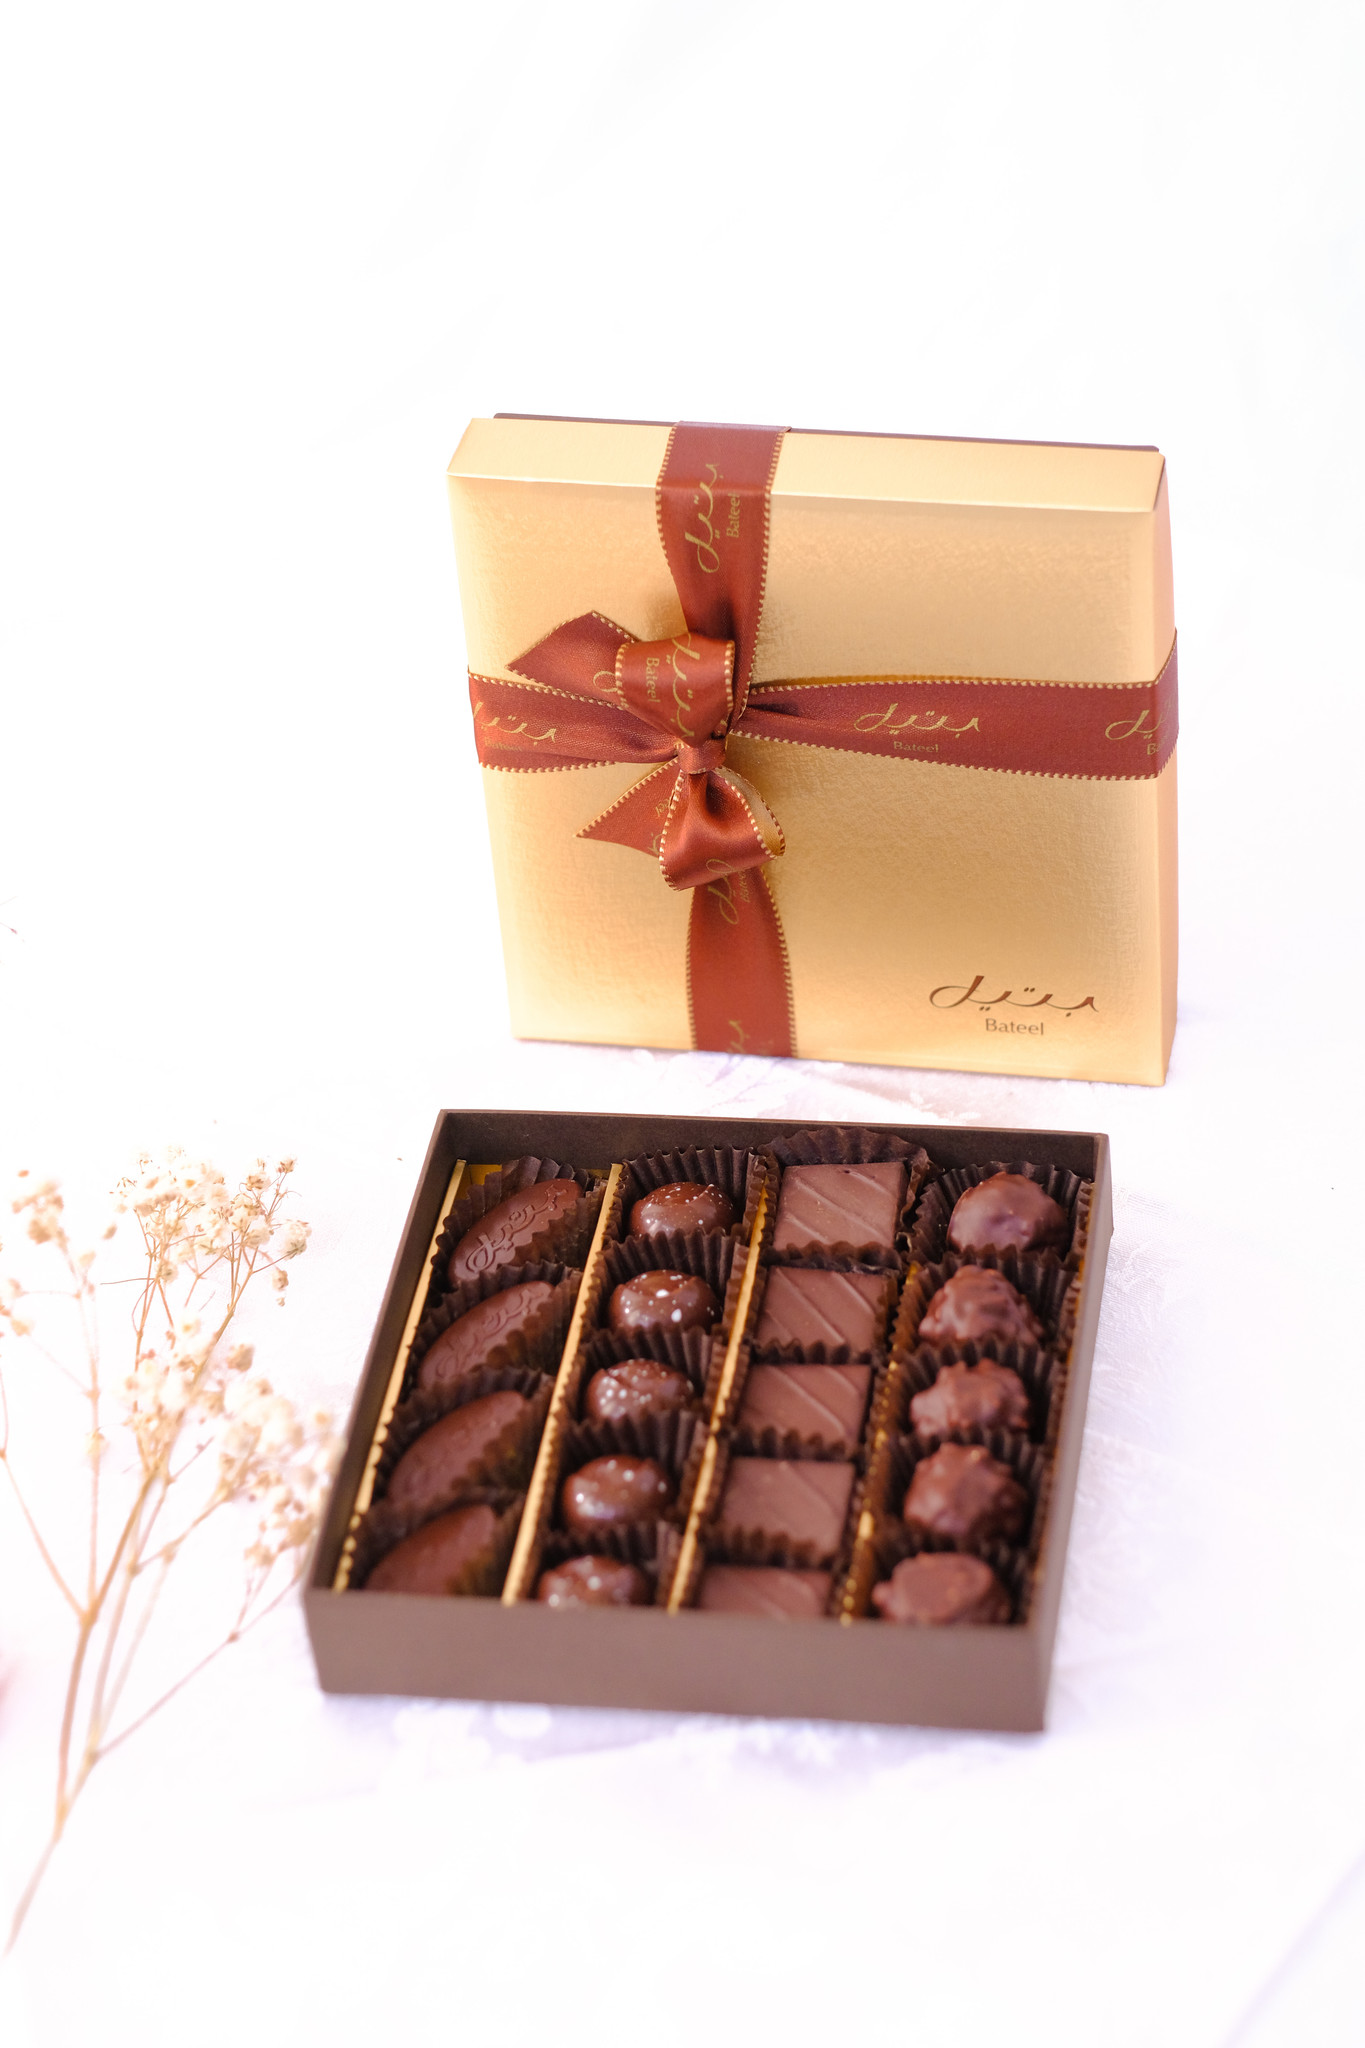 Bateel USA Cassandra S Dark Chocolate Lovers Assortment